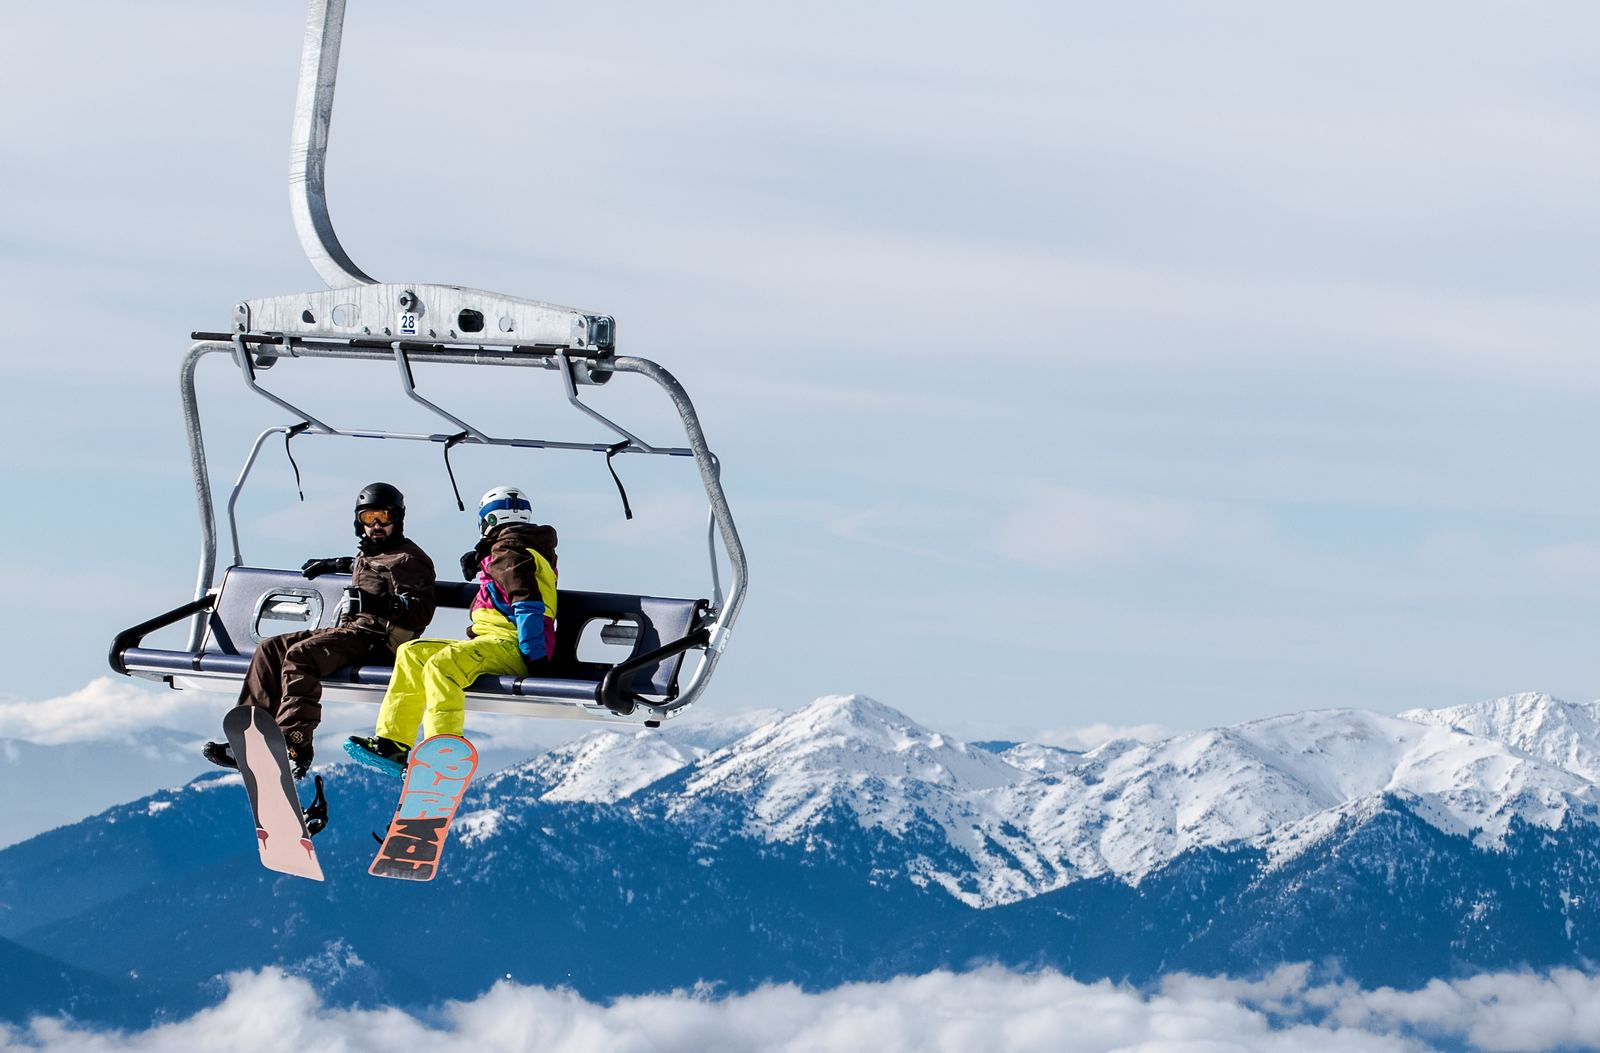 Snowboarding - Trentino